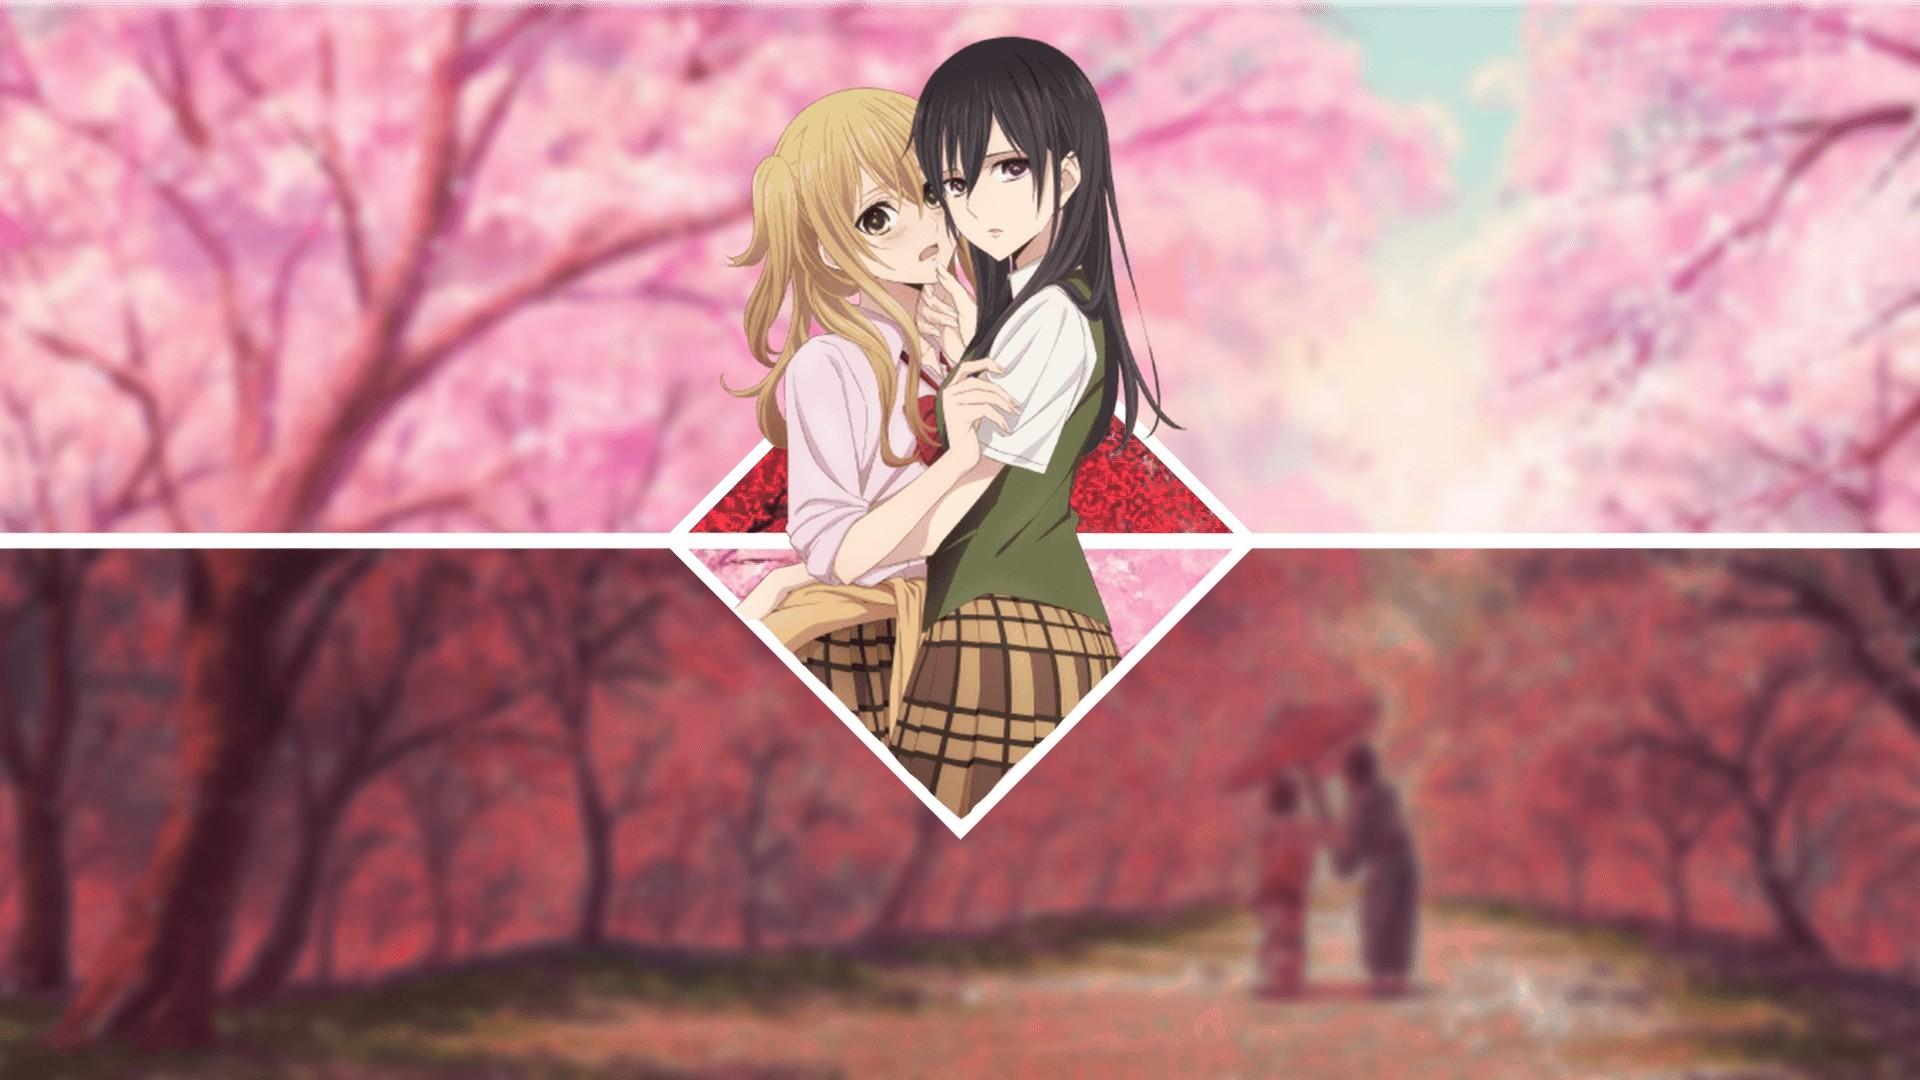 Citrus Anime HD wallpaper